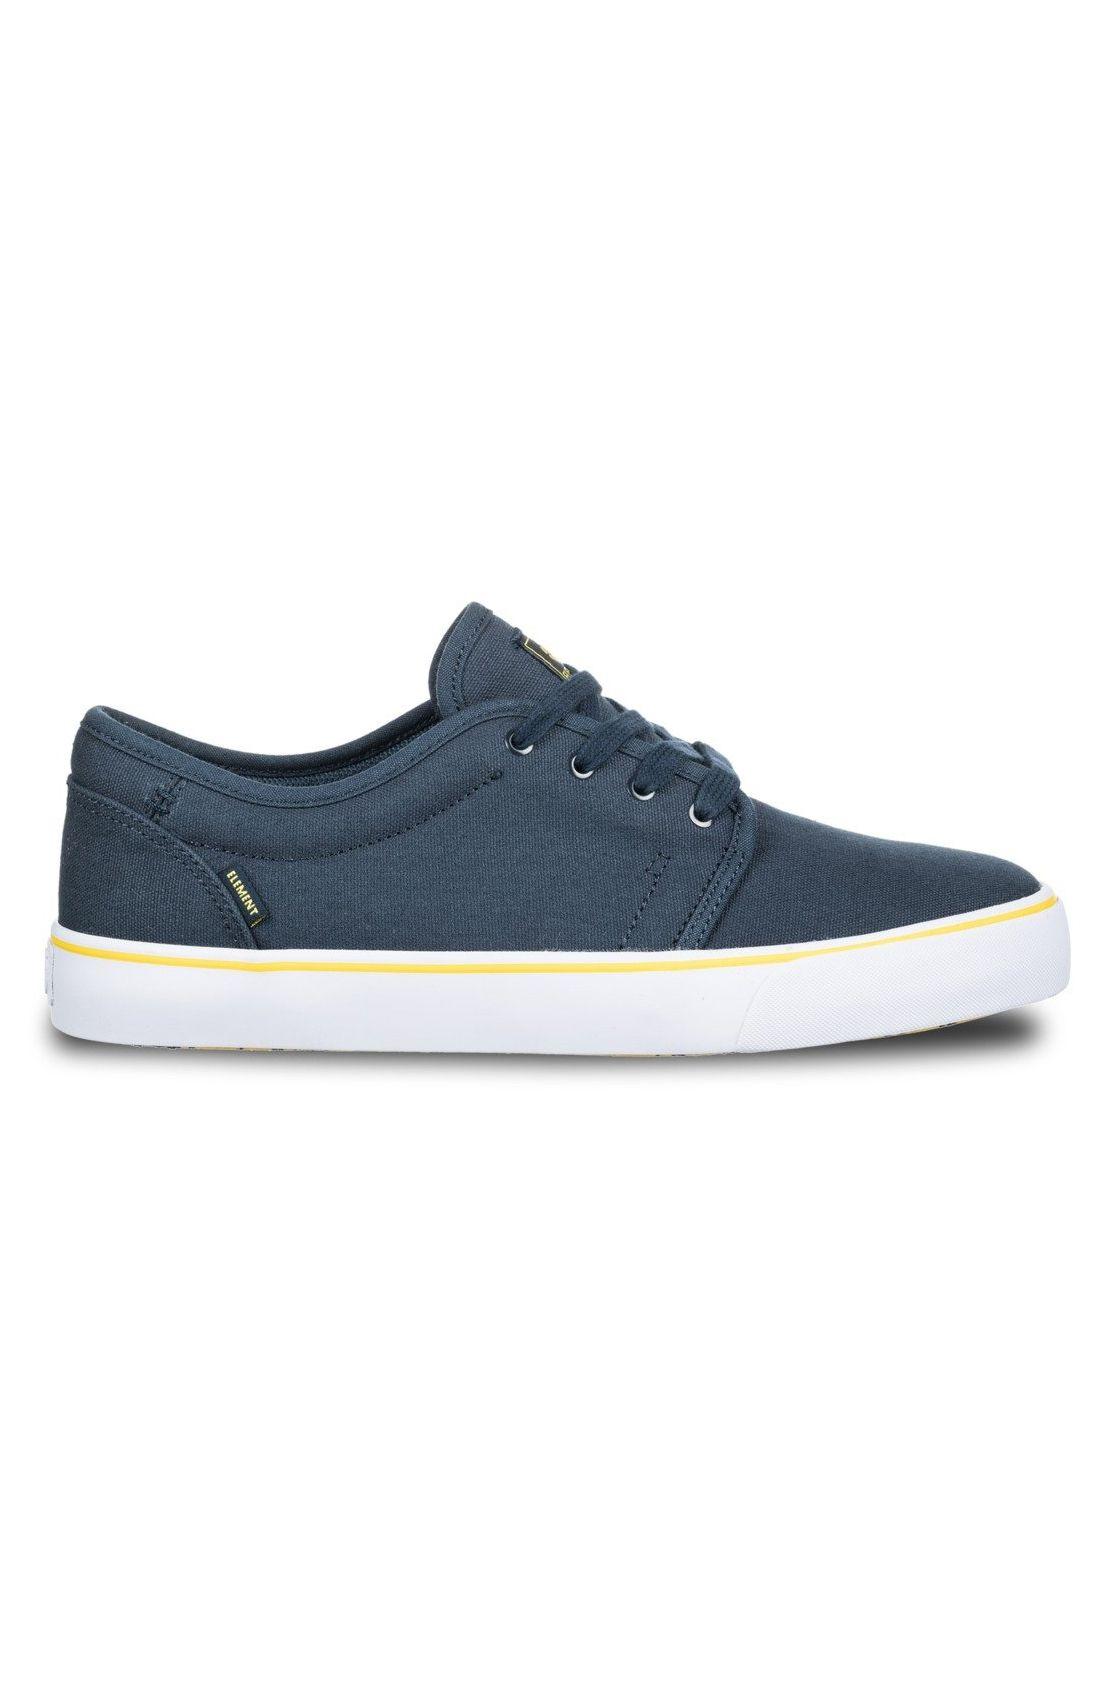 Element Shoes DARWIN Navy